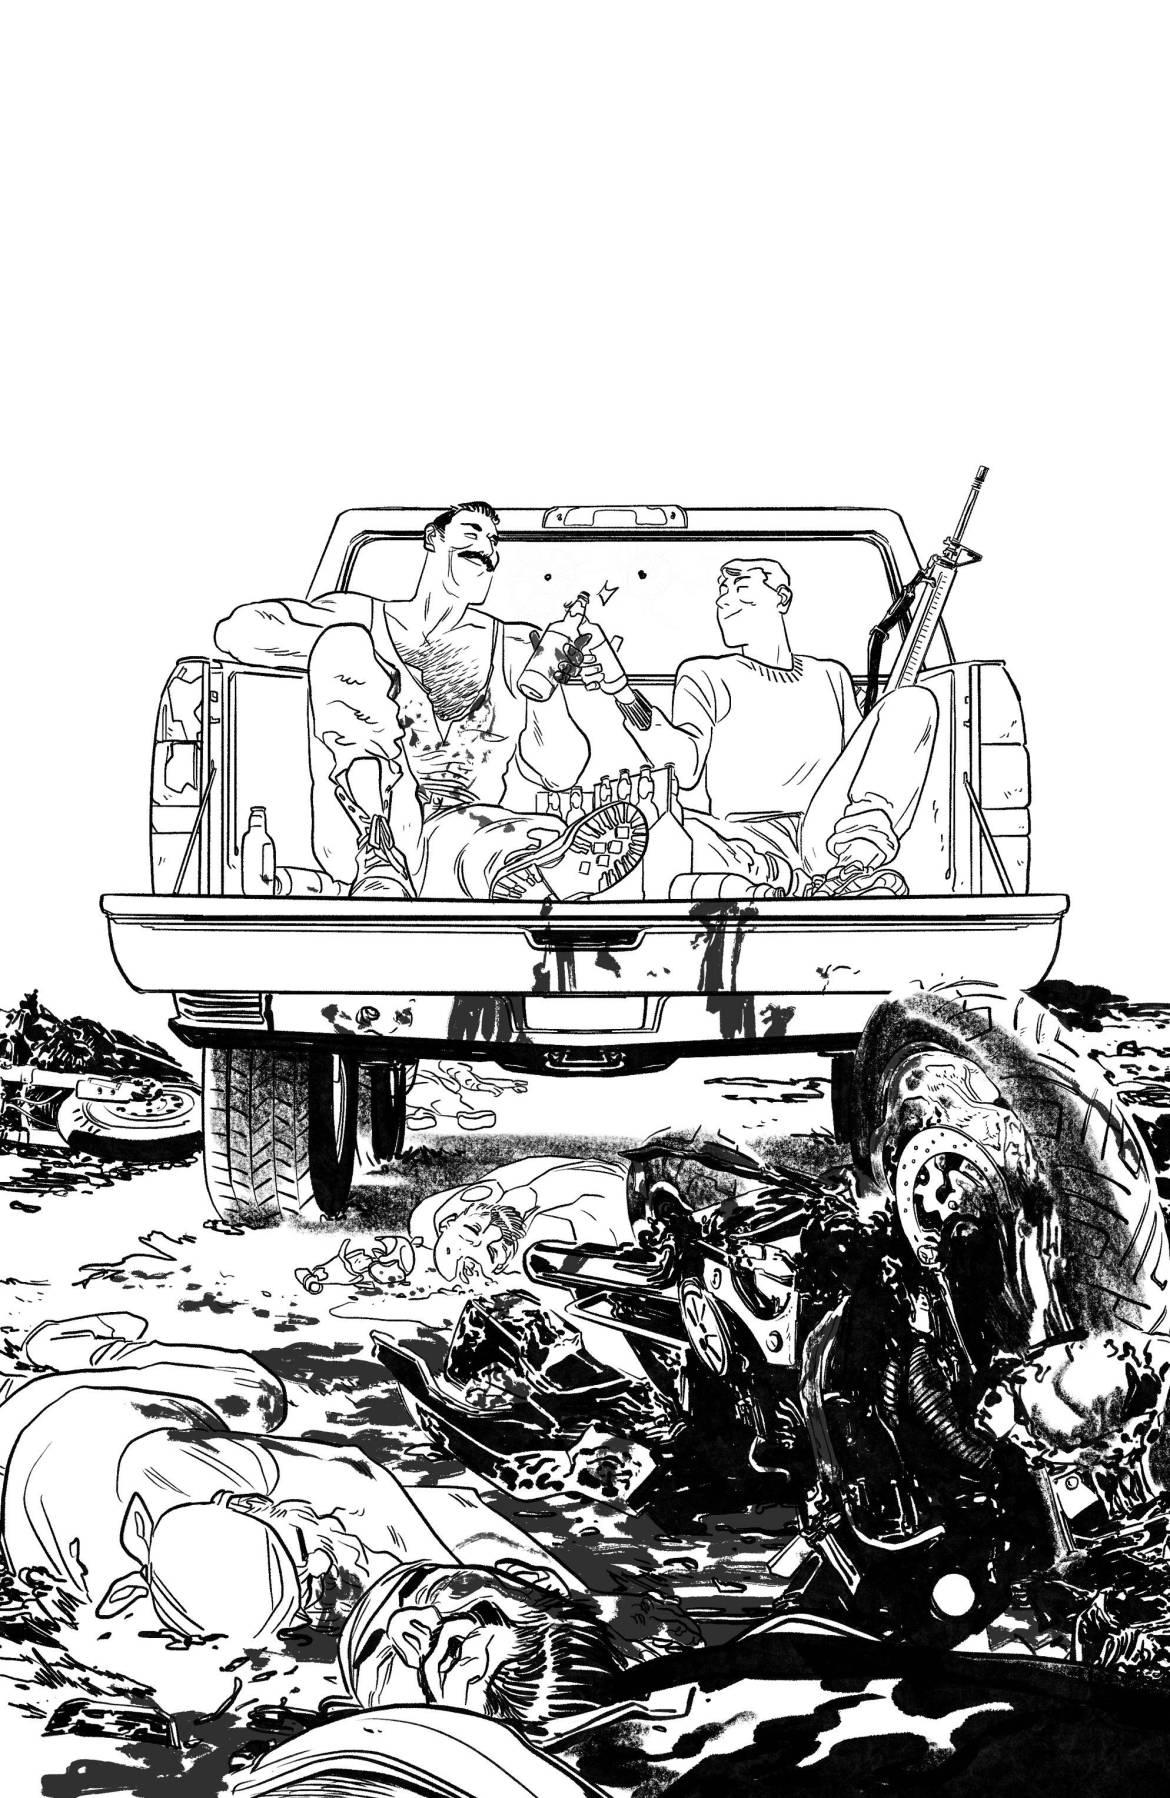 STL198530 ComicList: Image Comics New Releases for 07/21/2021